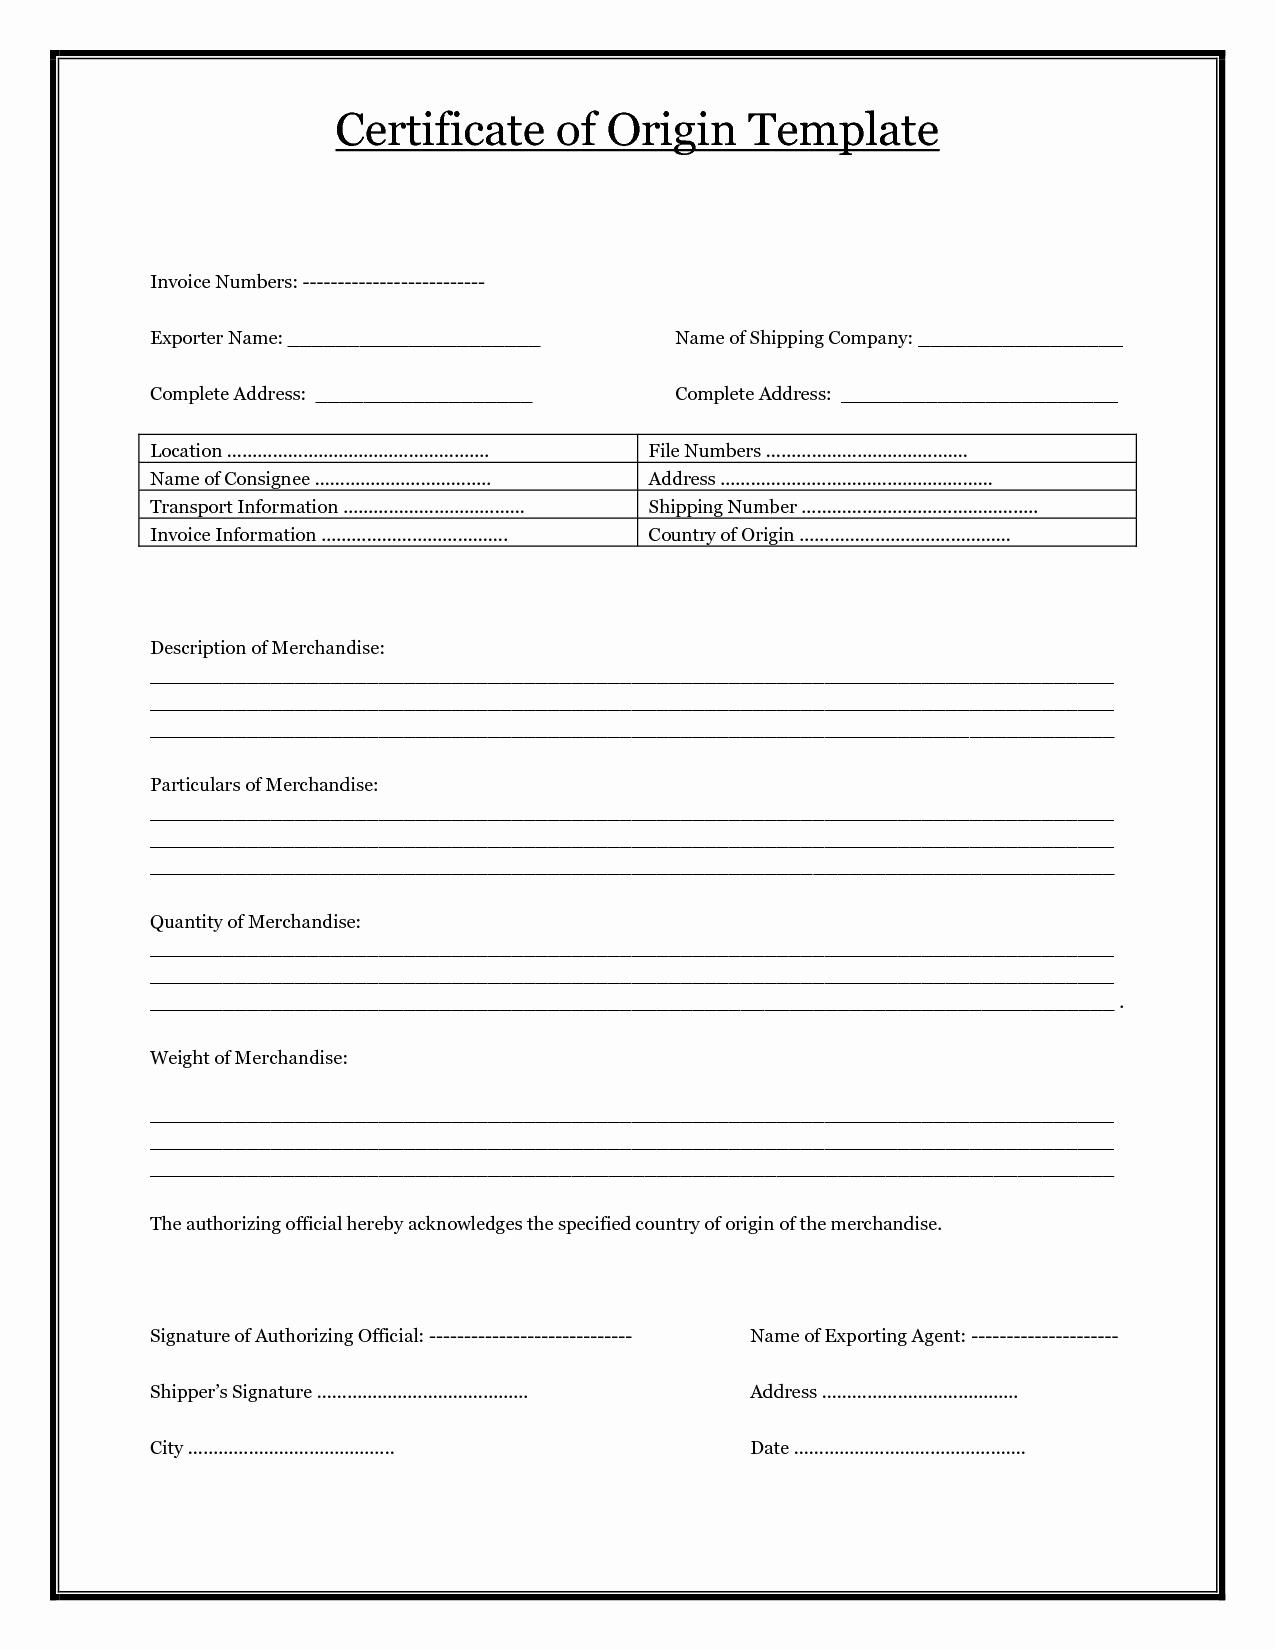 Certificate Of Data Destruction Template Elegant Certificate origin Template Pdf Image Collections